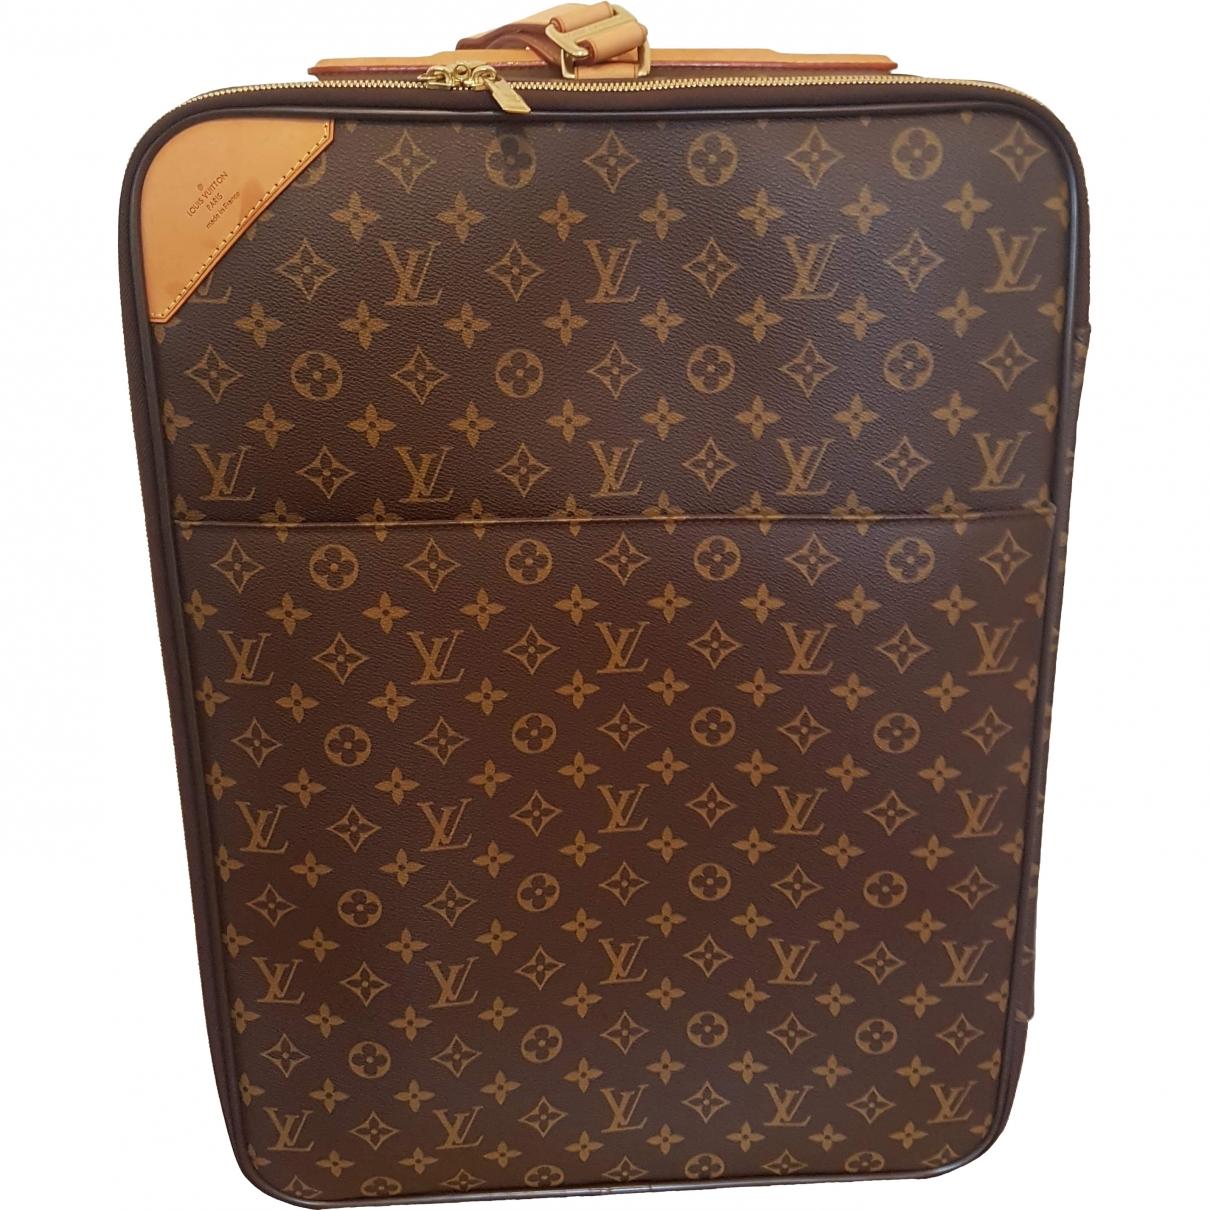 Louis Vuitton Pegase Reisetasche in Leinen